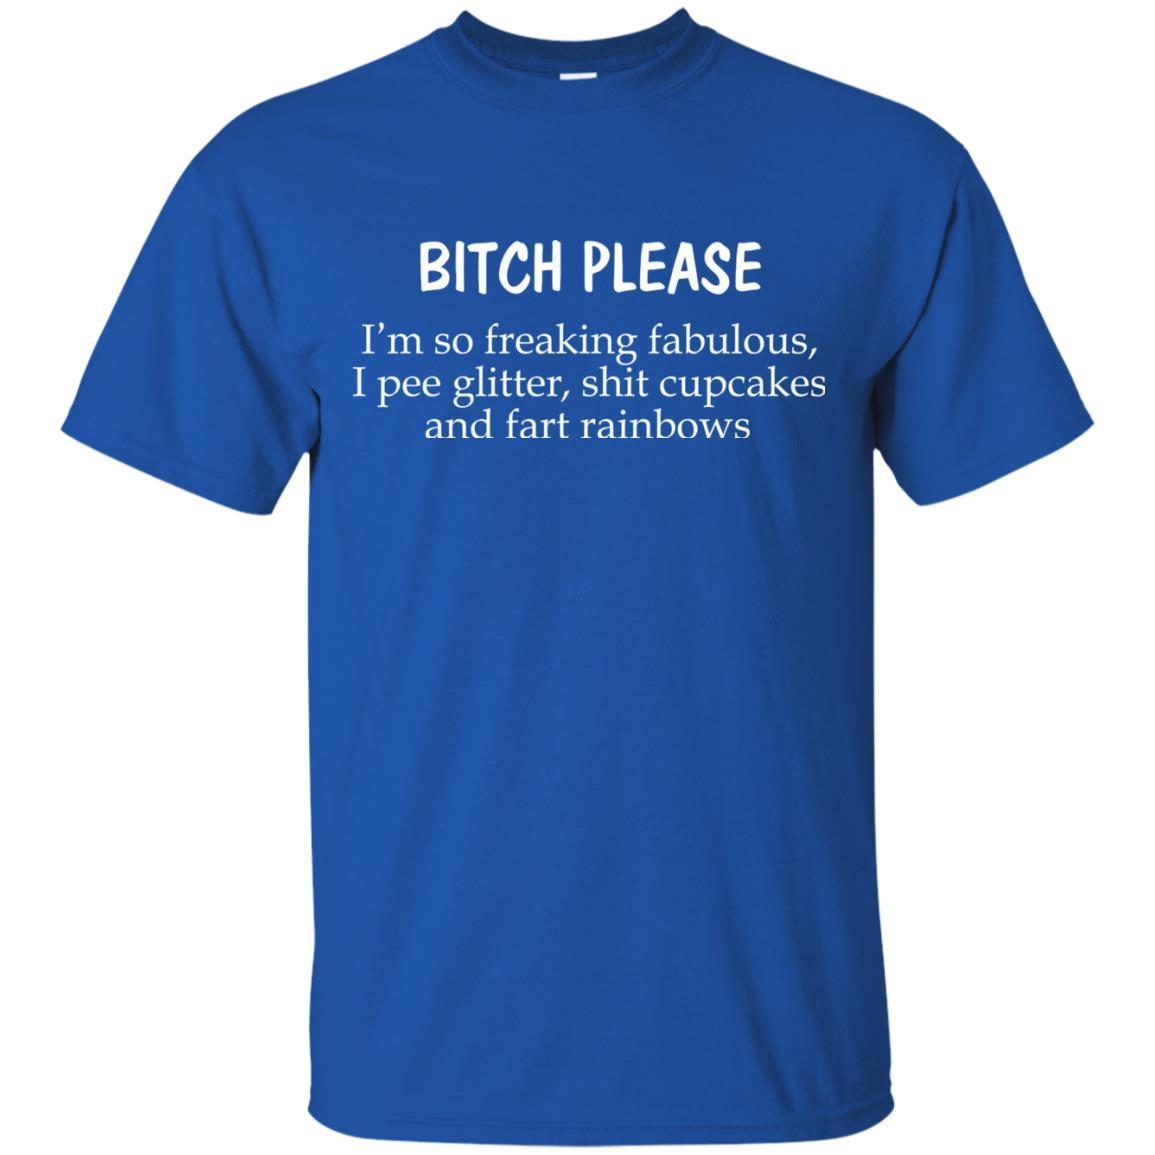 image 1243 - Bitch Please I'm so freaking fabulous t-shirt, sweater